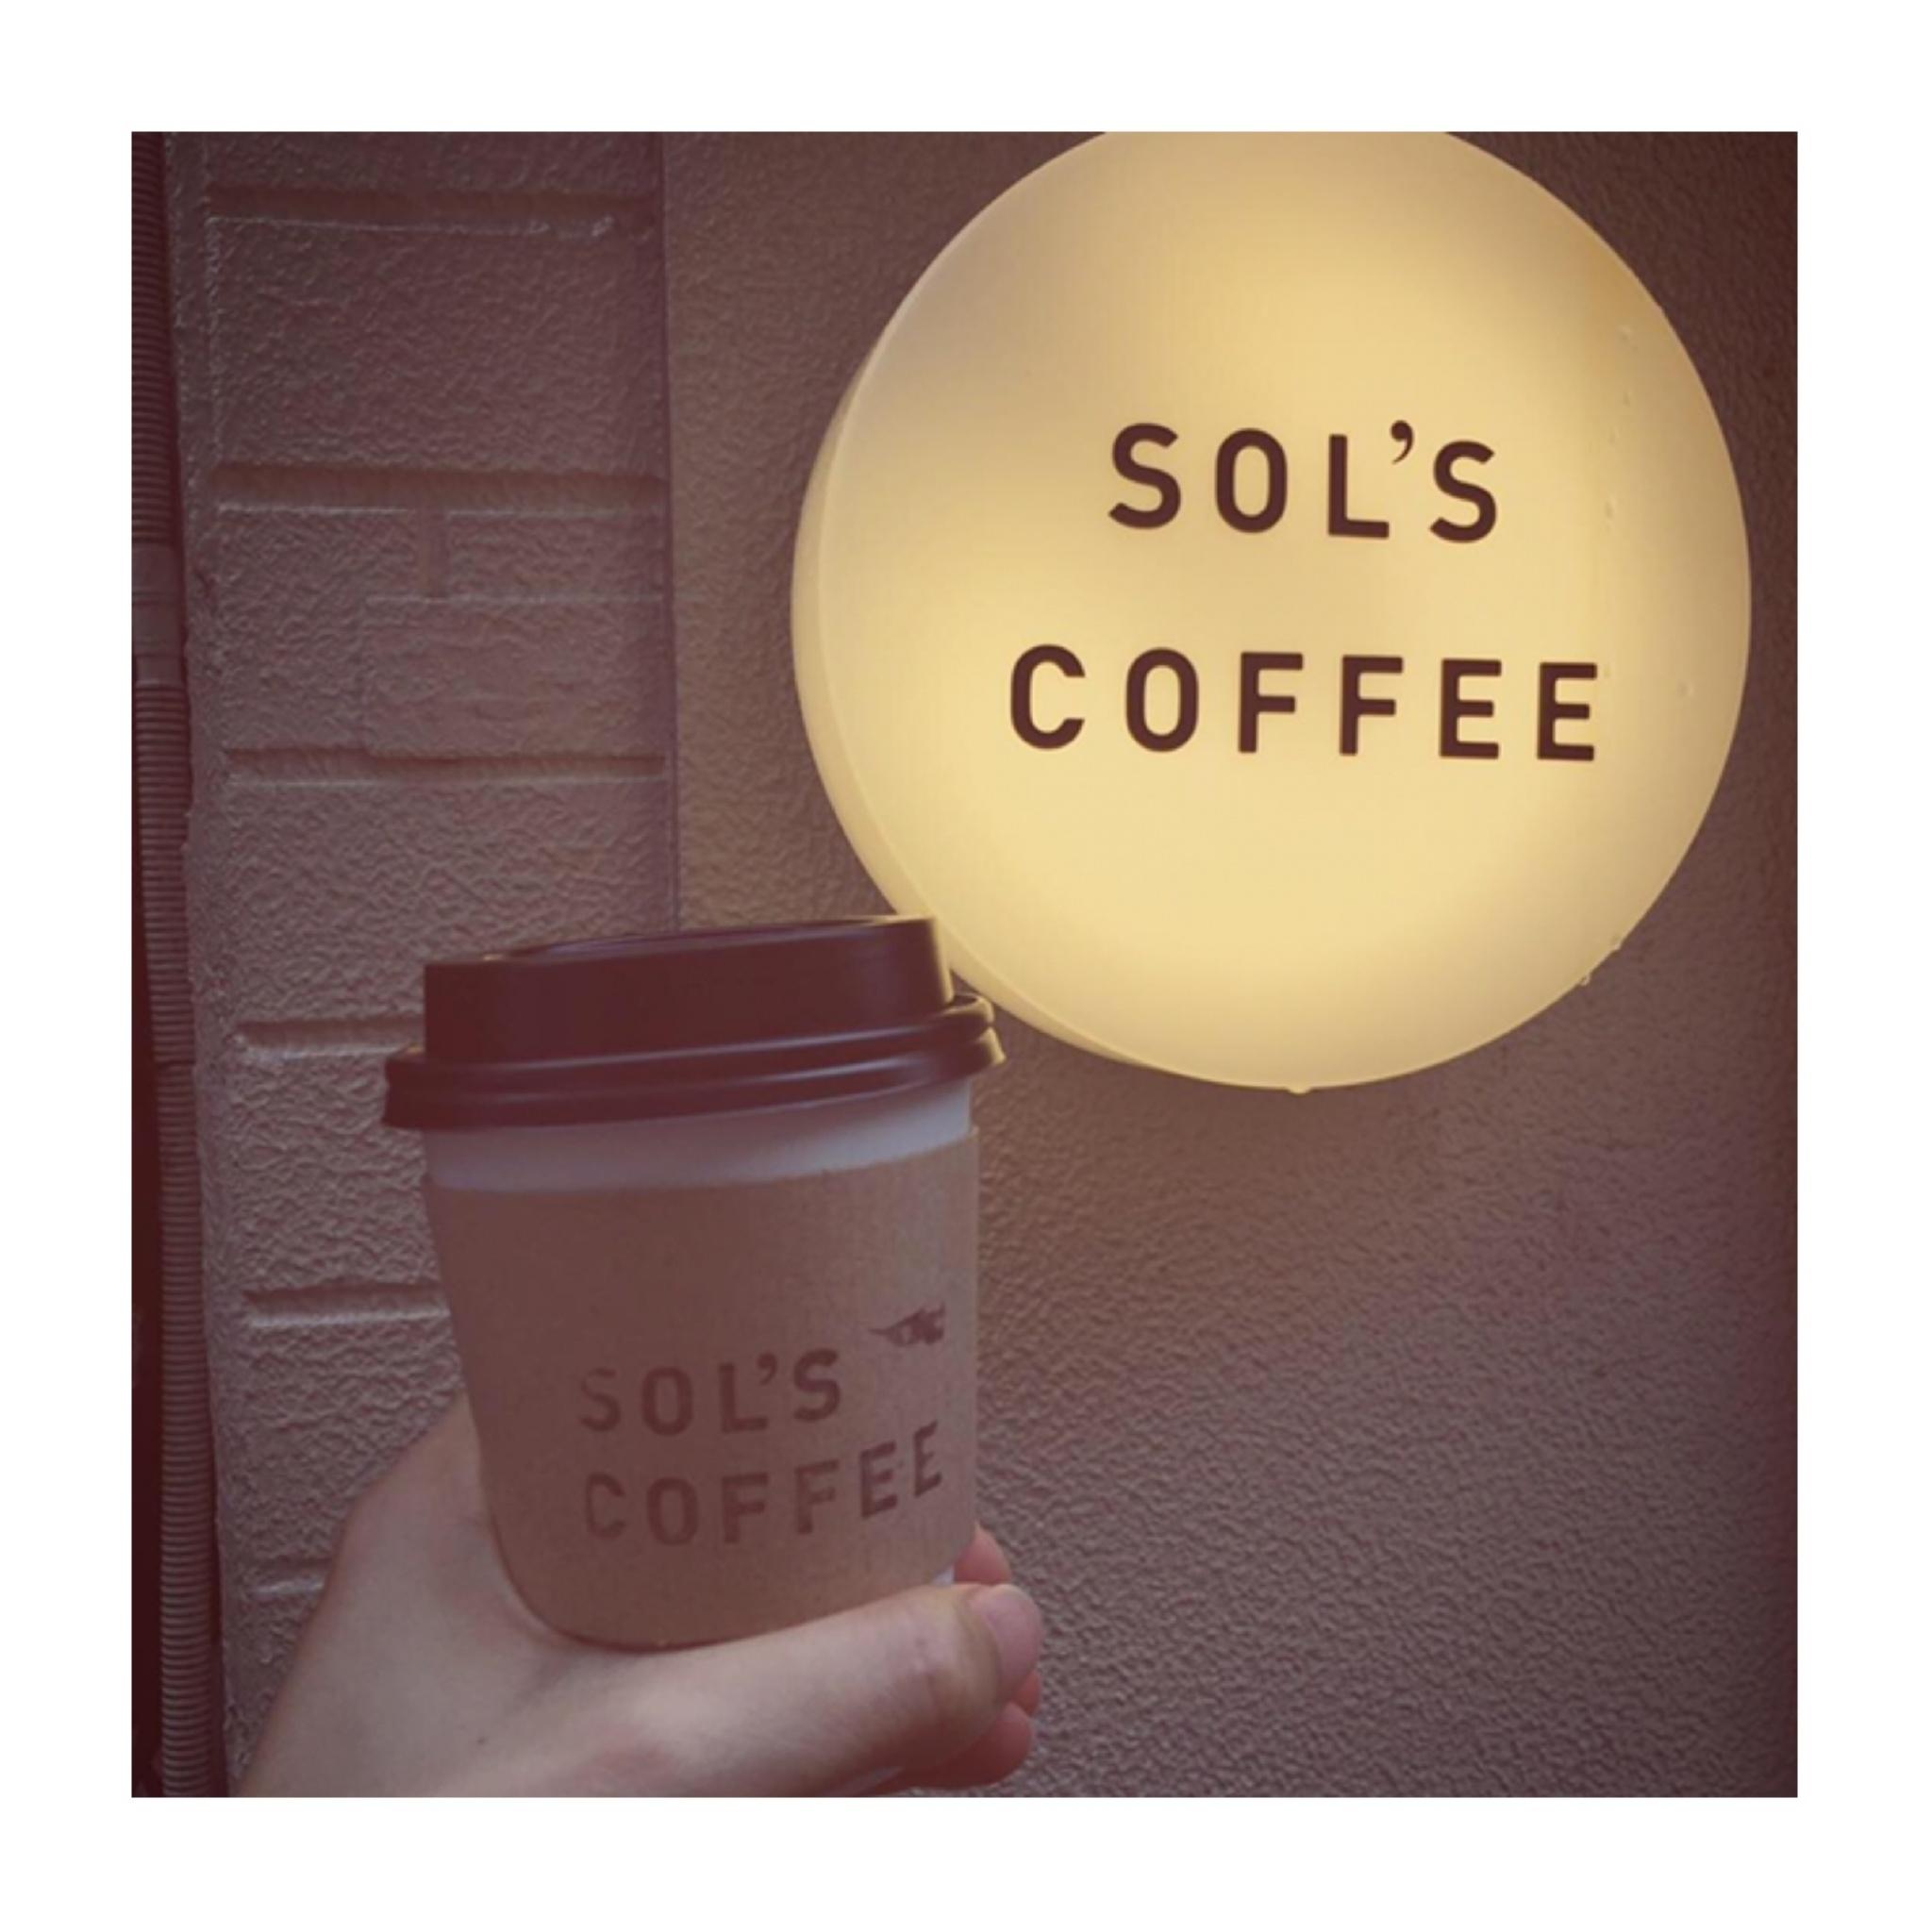 #15【#cafestagram】❤️:《東京•蔵前》身体にやさしいコーヒーを飲みに『SOL'S COFFEE』へ☻_5